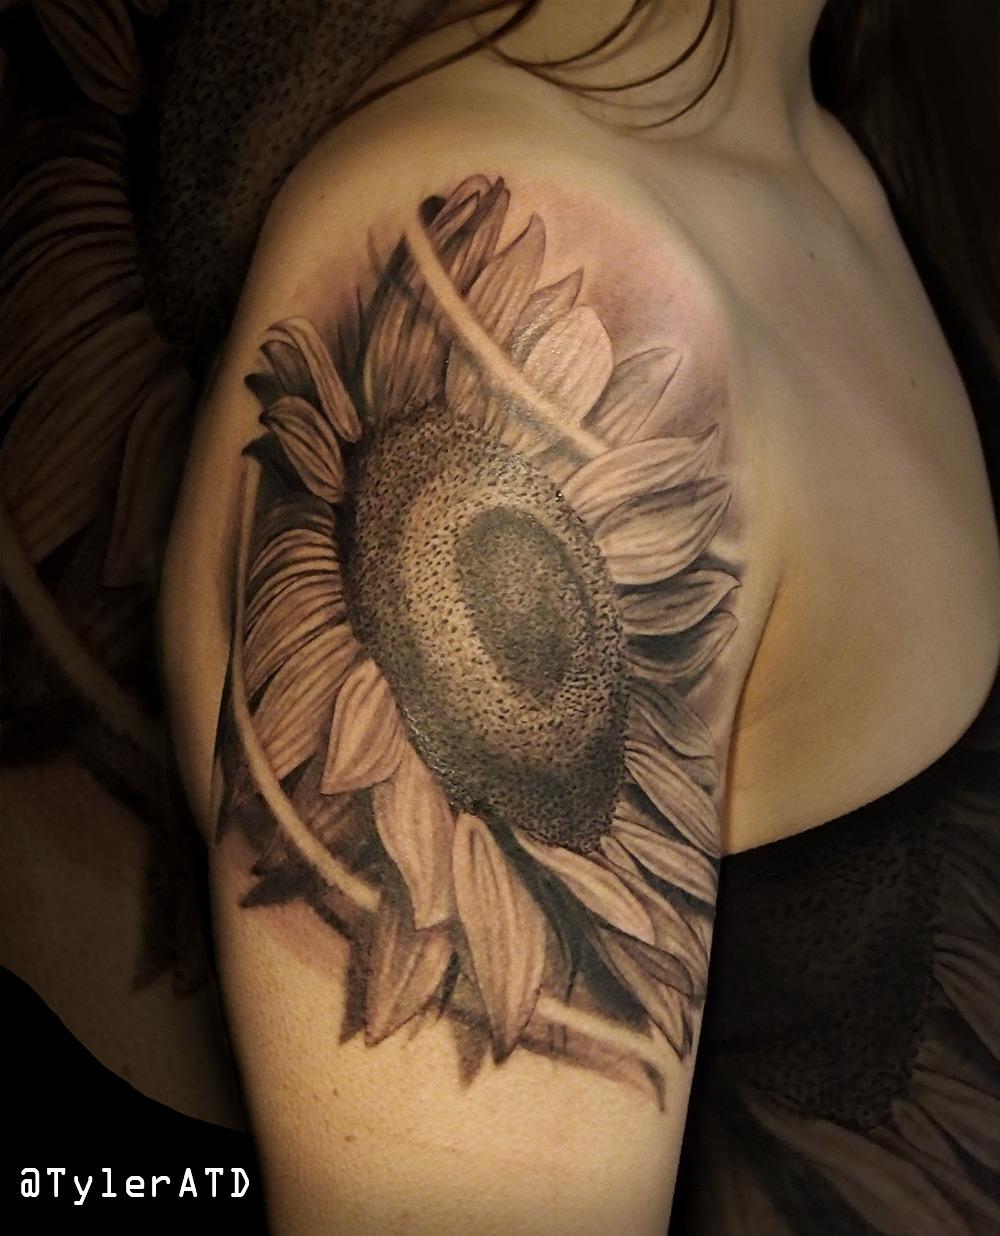 Sunflower Tattoo Tumblr : sunflower, tattoo, tumblr, Tyler, Tattoos, Realistic, Black, Sunflower, Tattoo....